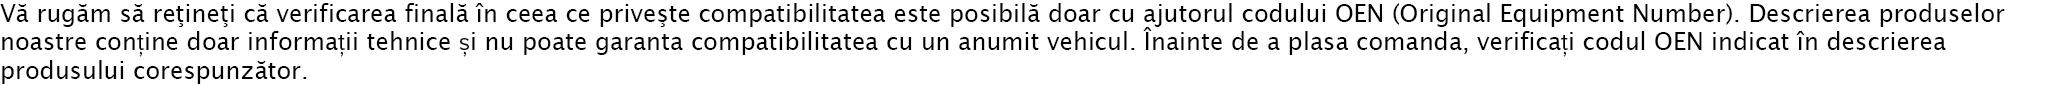 HERTH+BUSS JAKOPARTS 045 115 389 C, 045 115 389 E, 045 115 389 H, 045 115 389 J, 045 115 389 K Filtru ulei